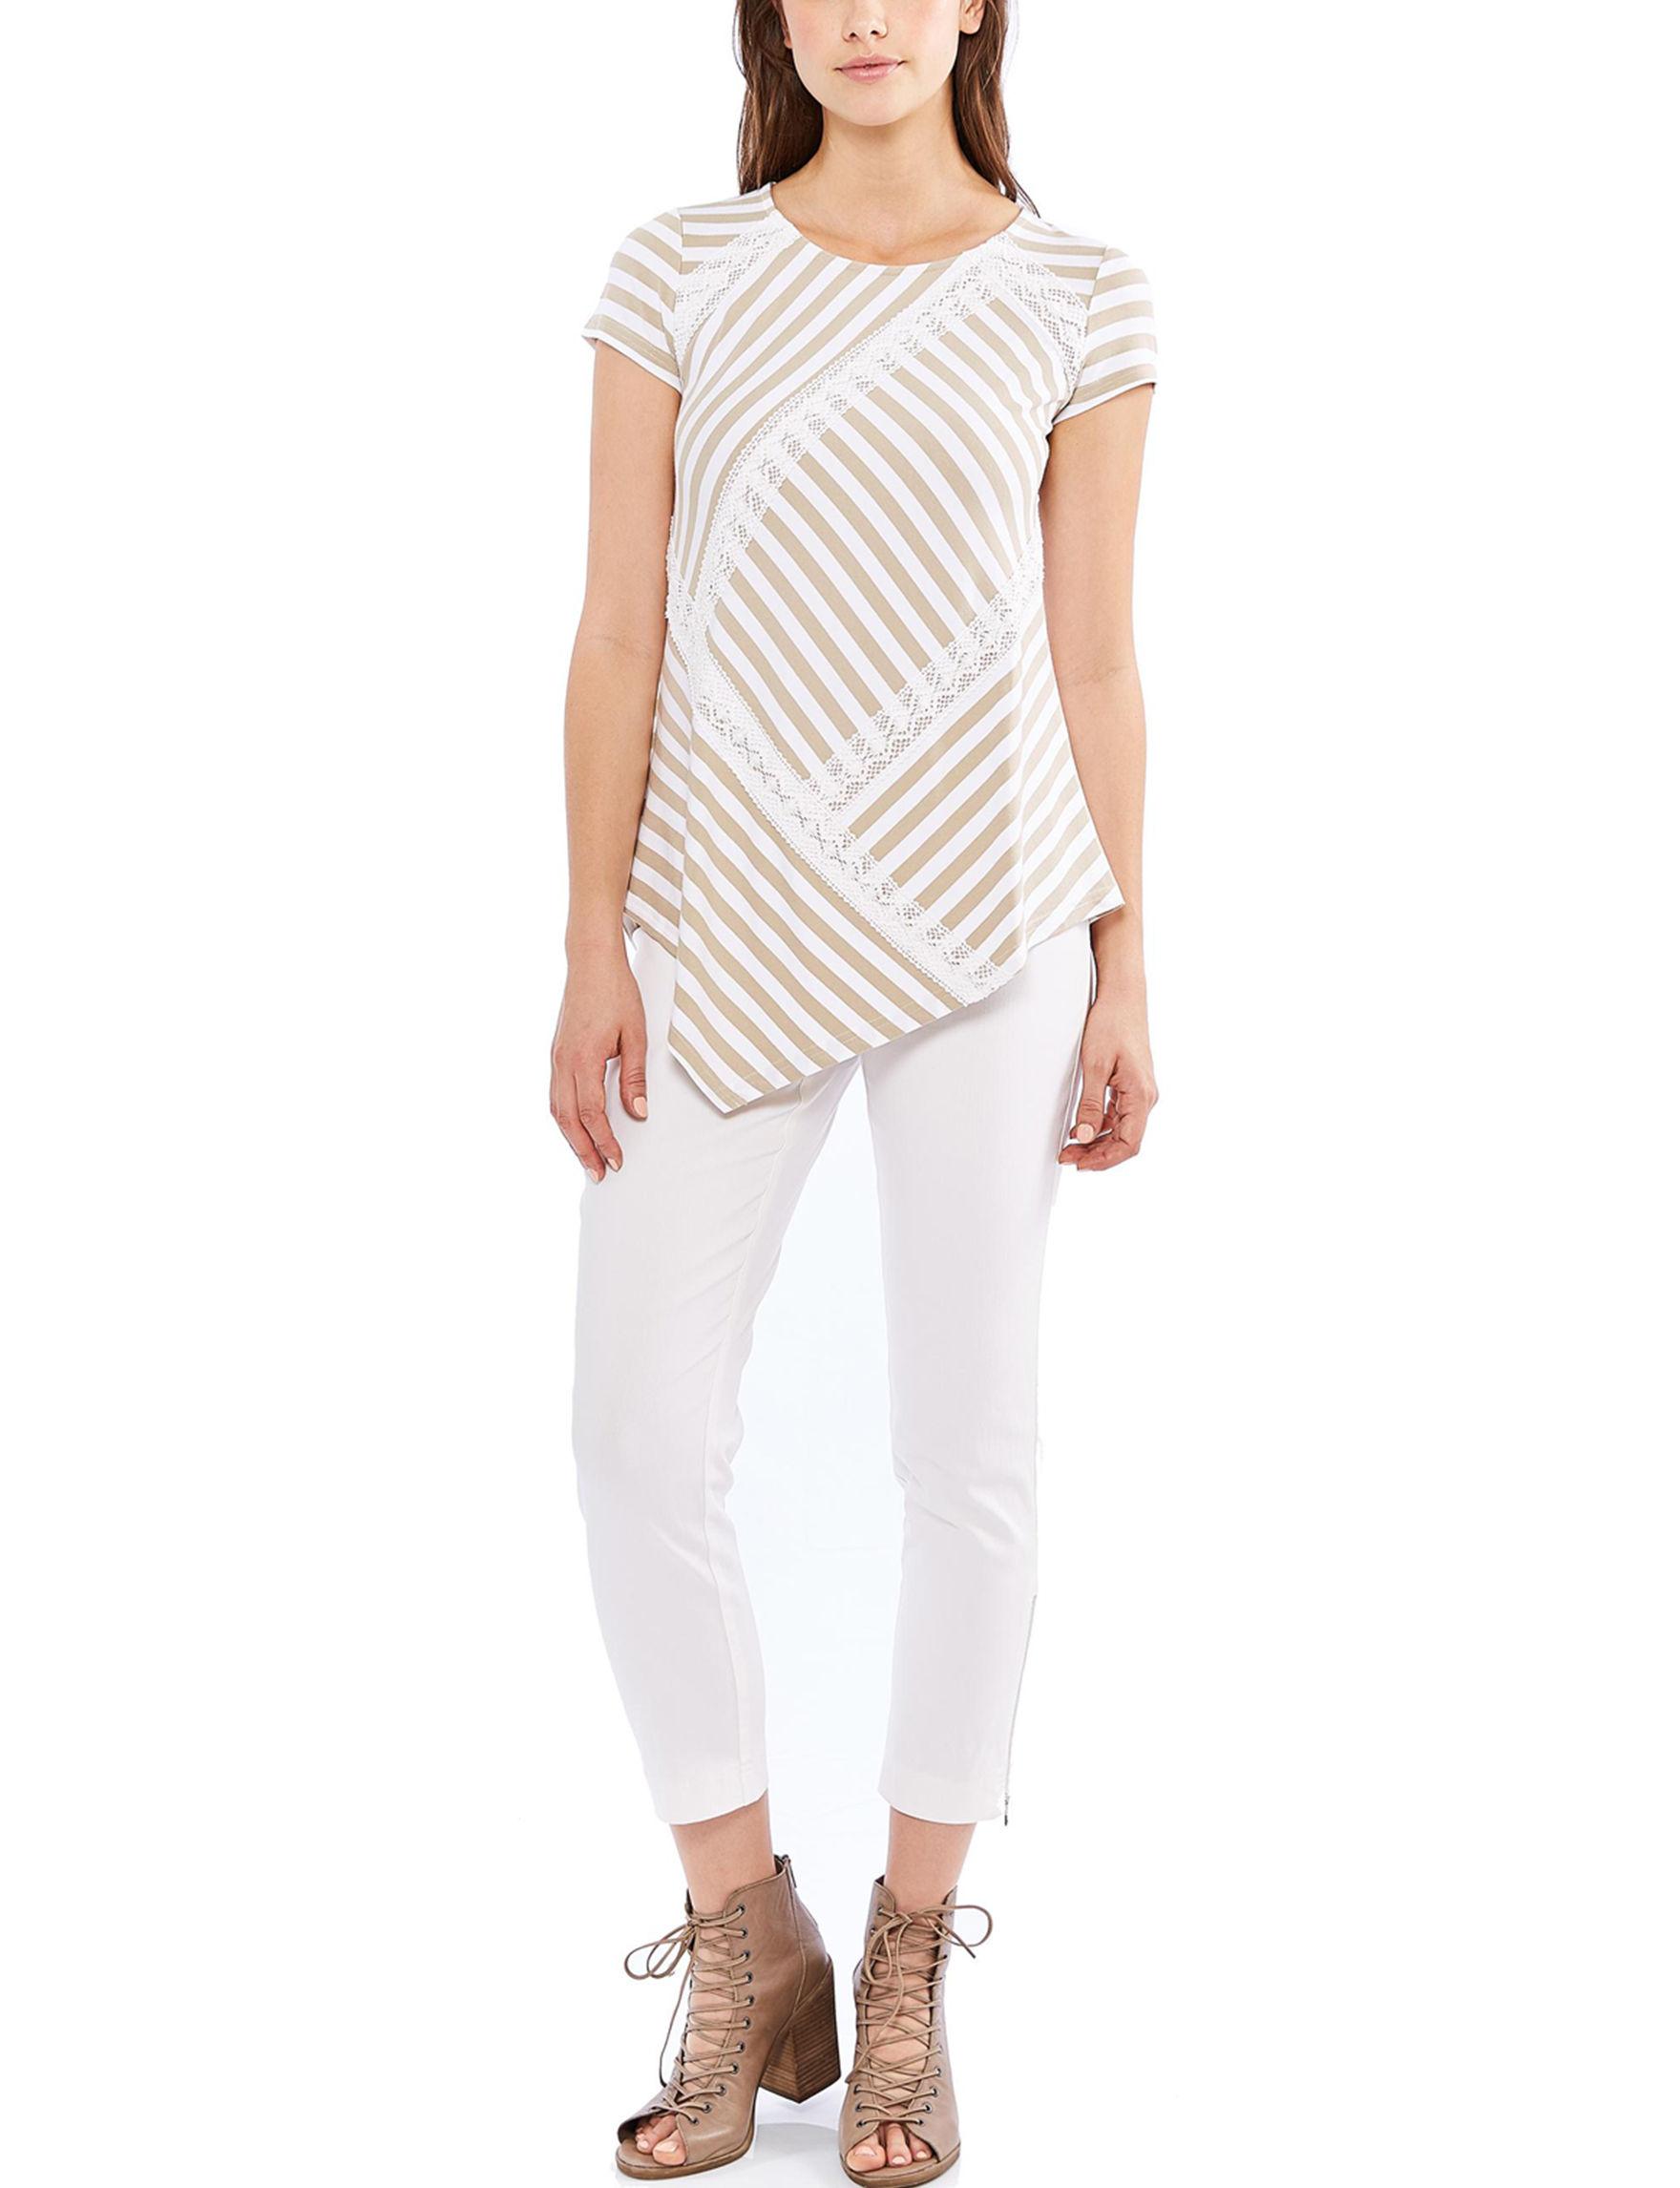 Skyes The Limit Tan / White Shirts & Blouses